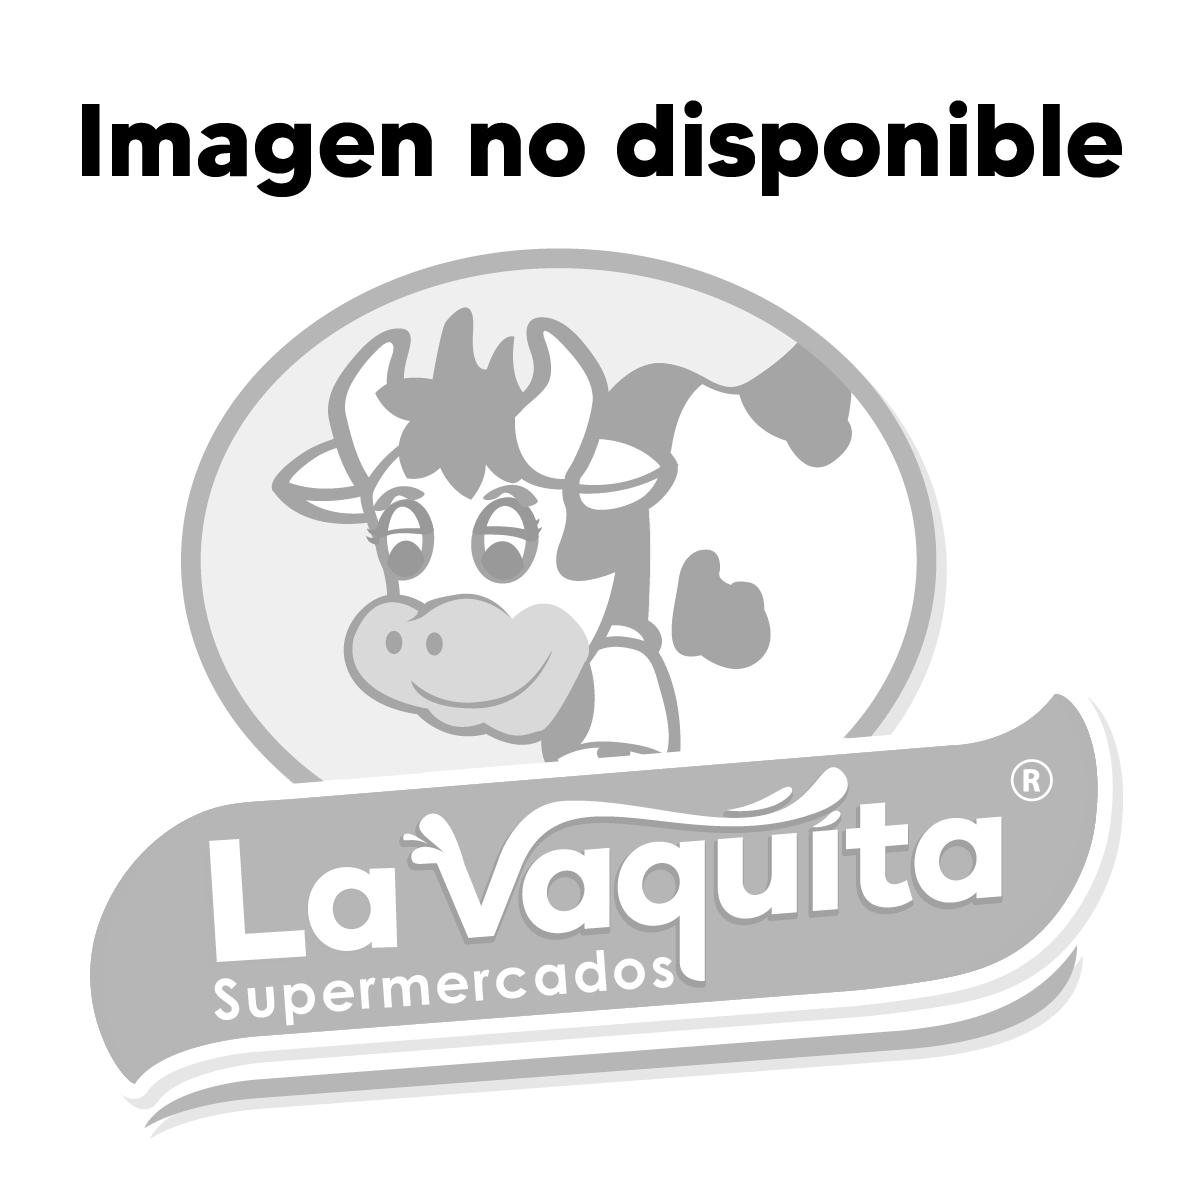 COPITO MK PAG 50U LLEVE 80U CANISTER